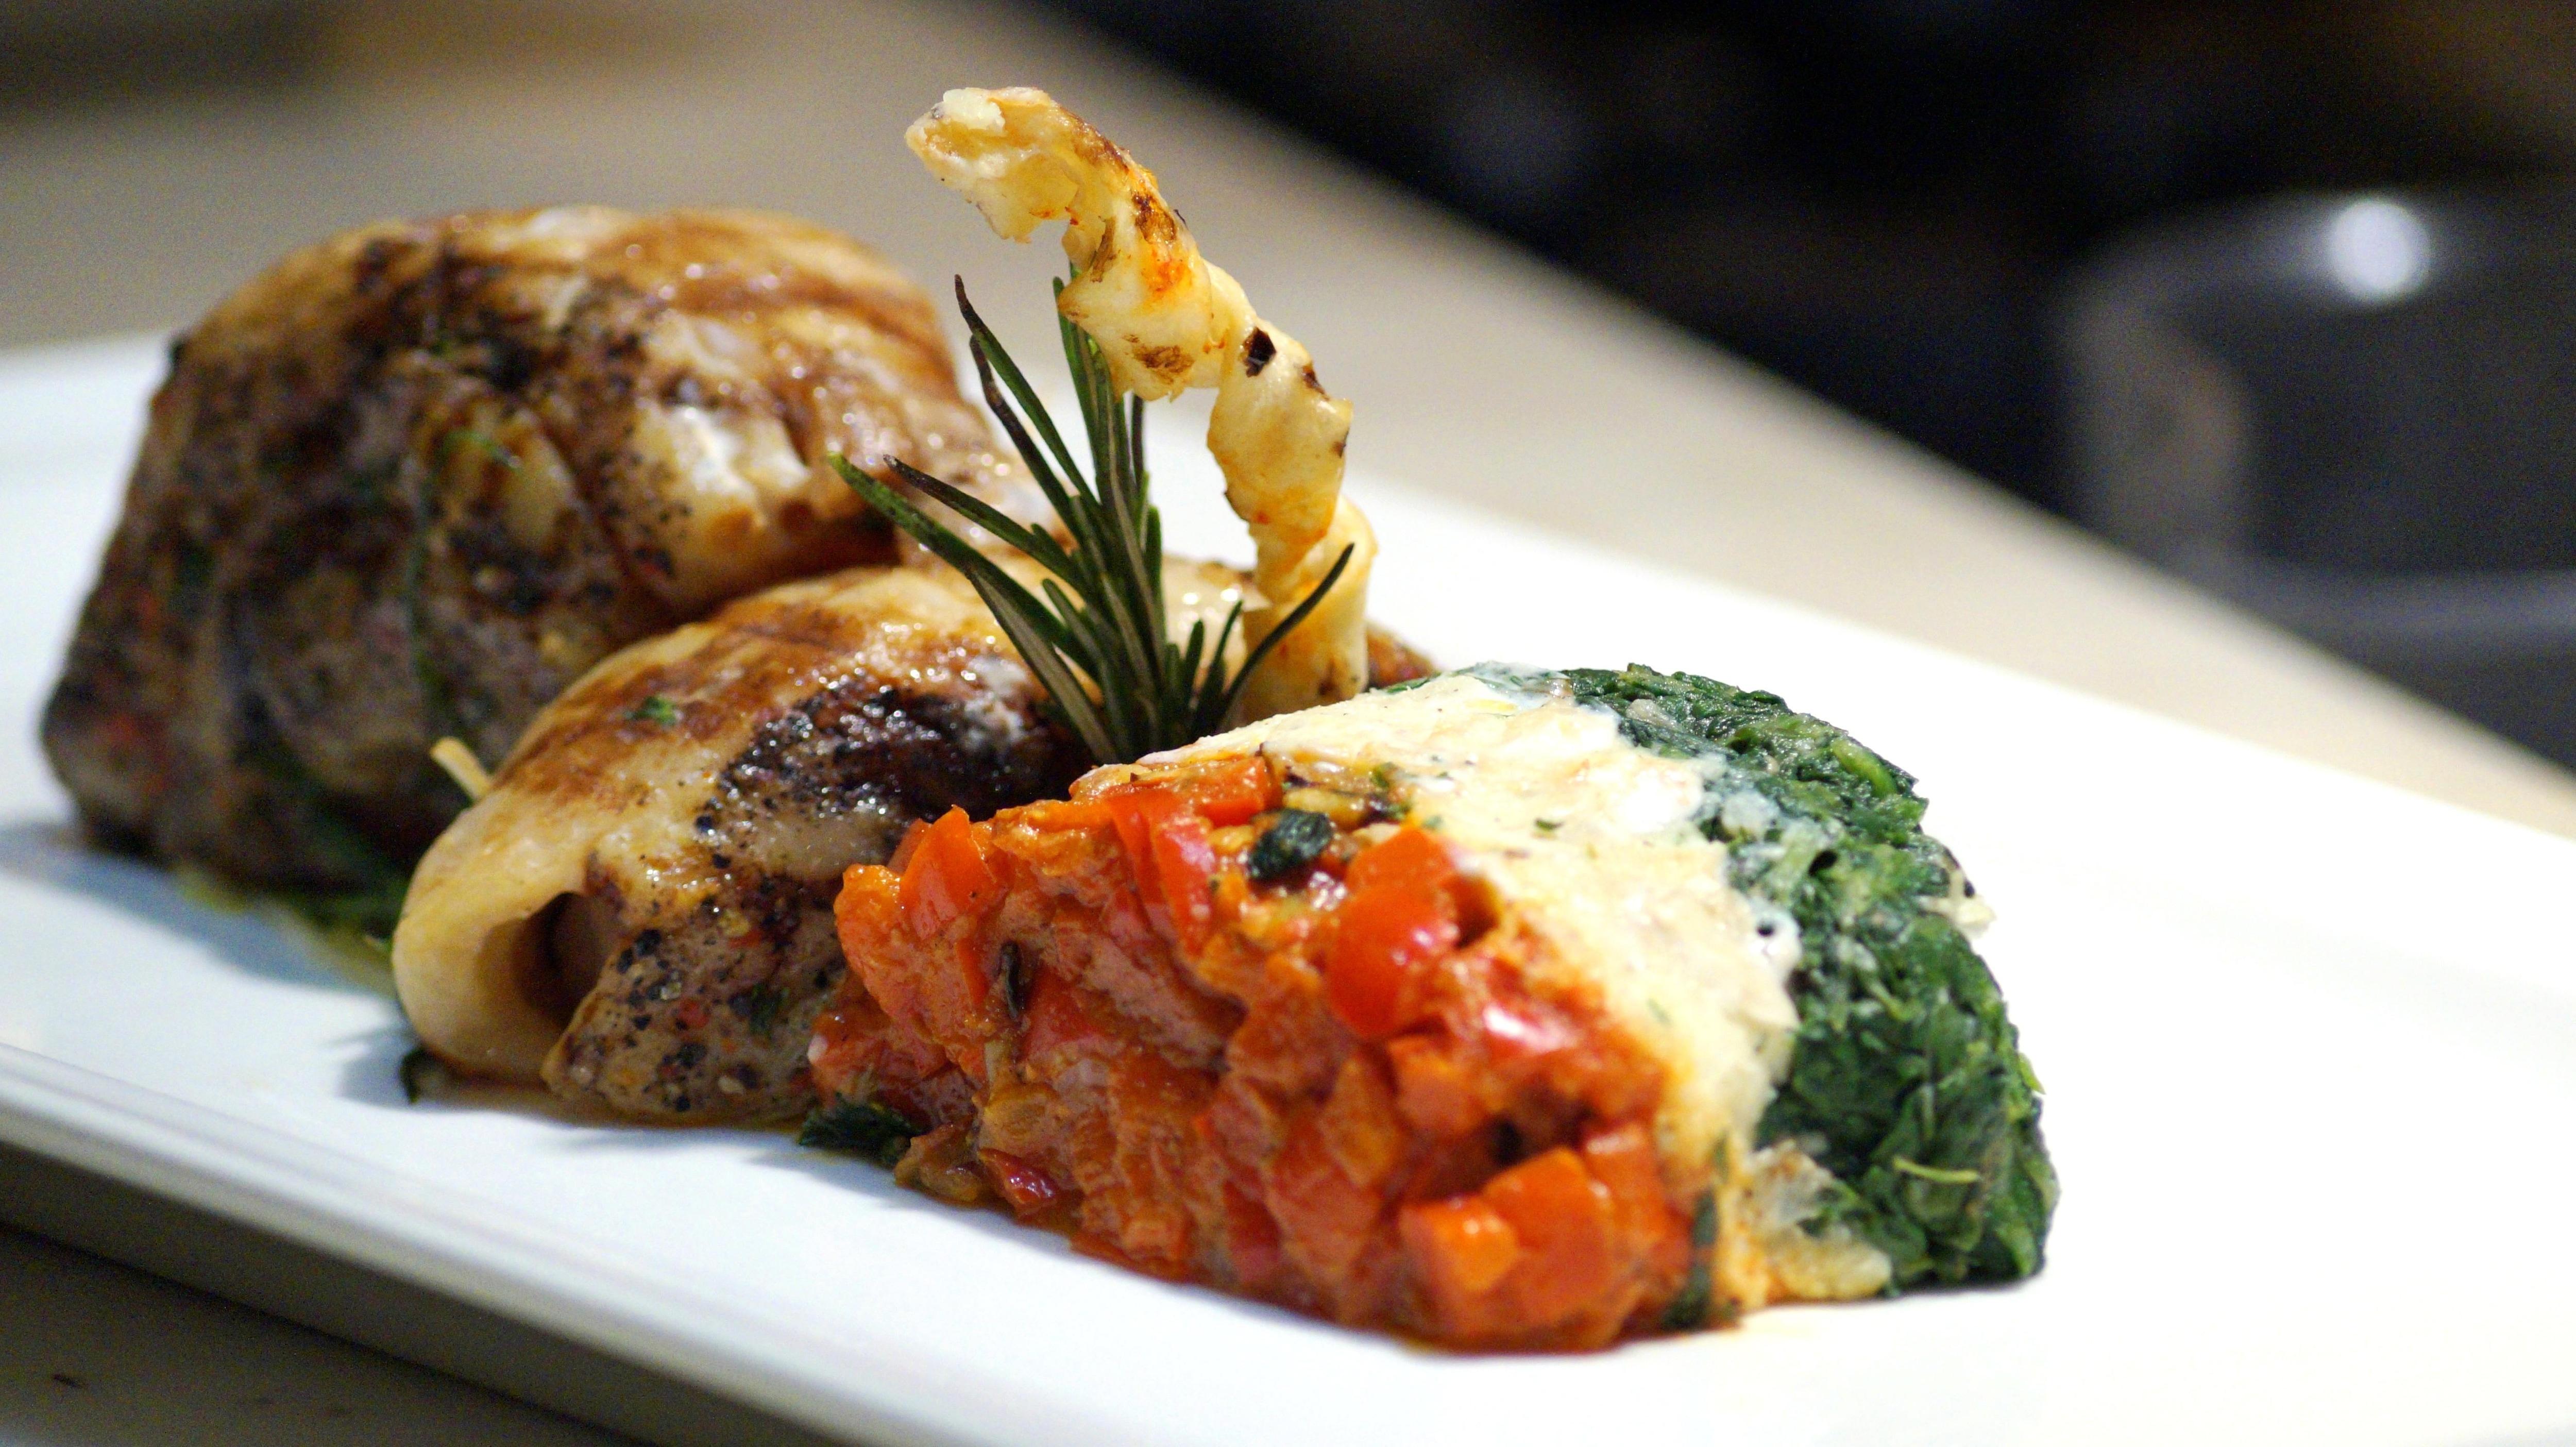 Republic Day 2016: Best Deals at Restaurants Across India